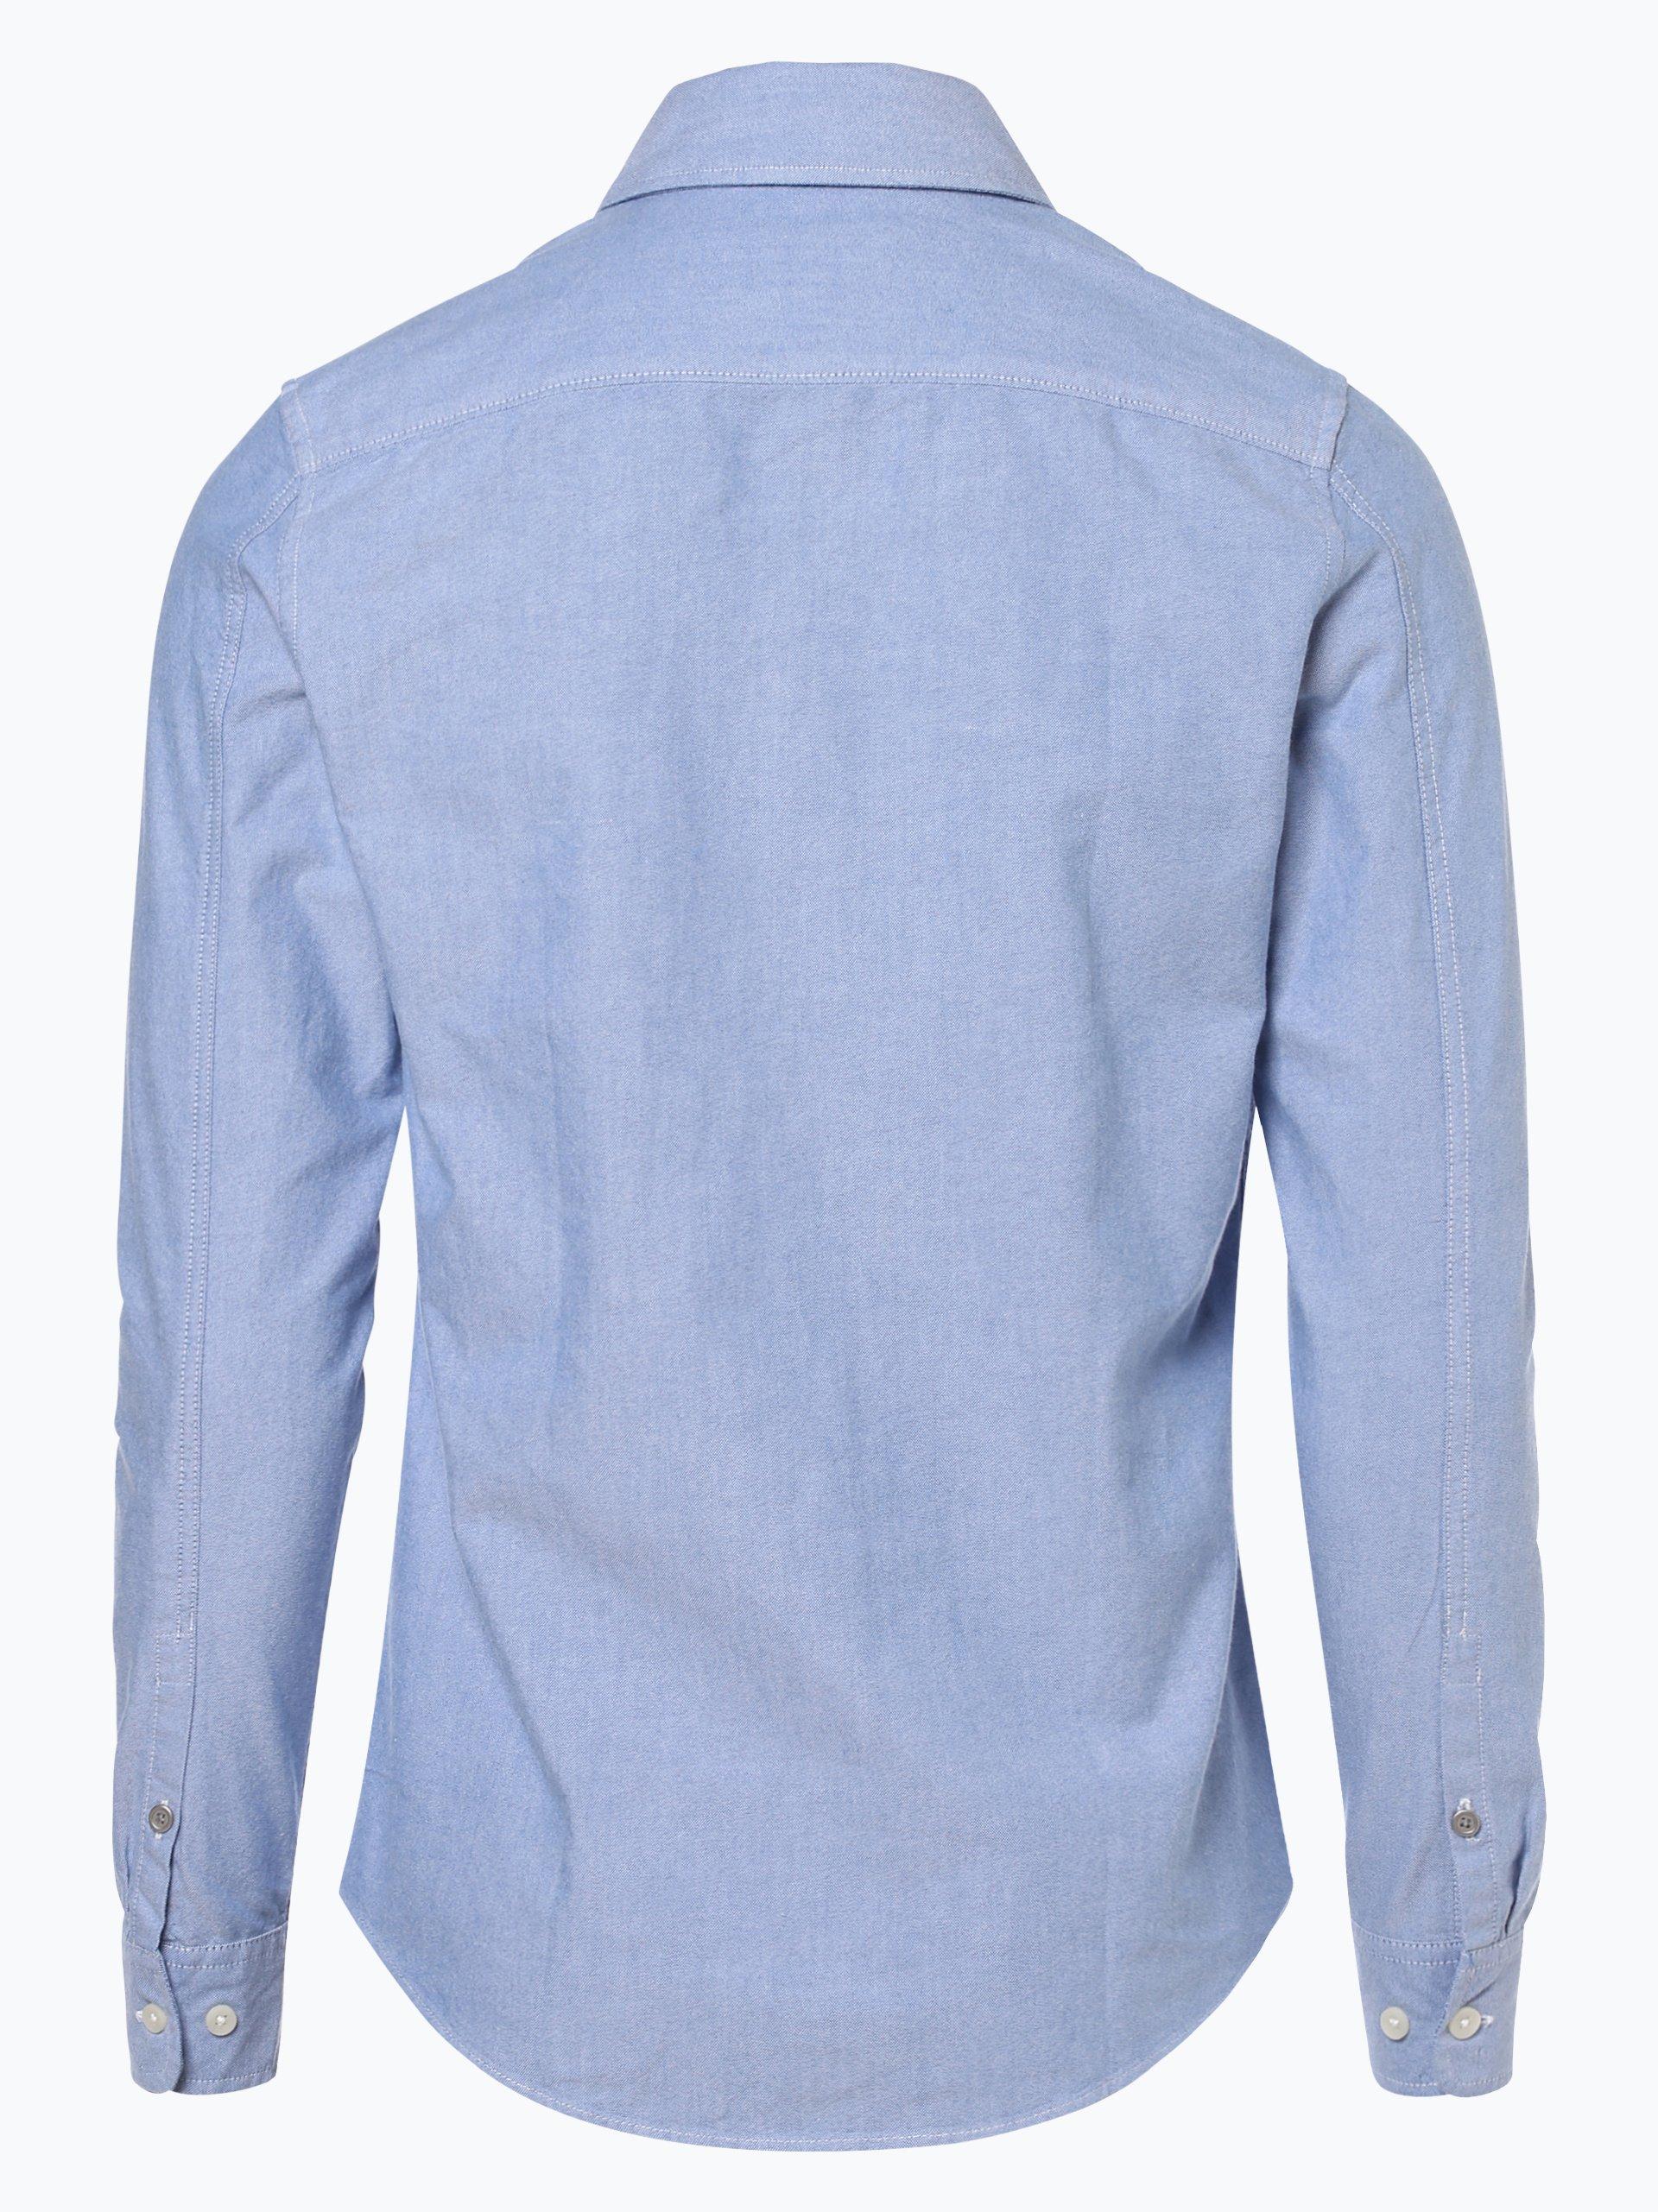 calvin klein jeans herren hemd hellblau uni online kaufen. Black Bedroom Furniture Sets. Home Design Ideas